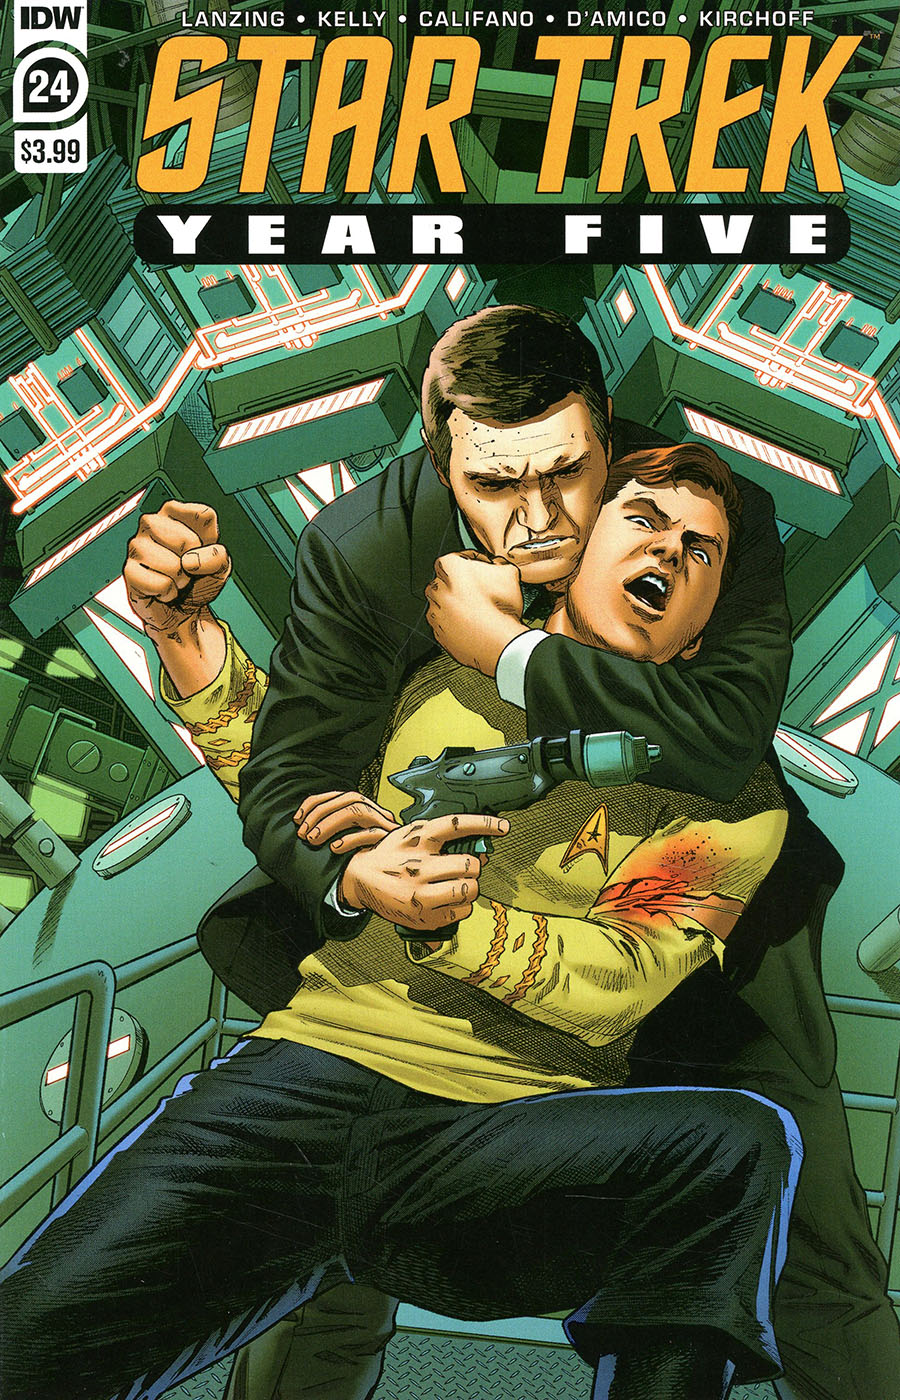 Star Trek Year Five #24 Cover A Regular Stephen Thompson Cover